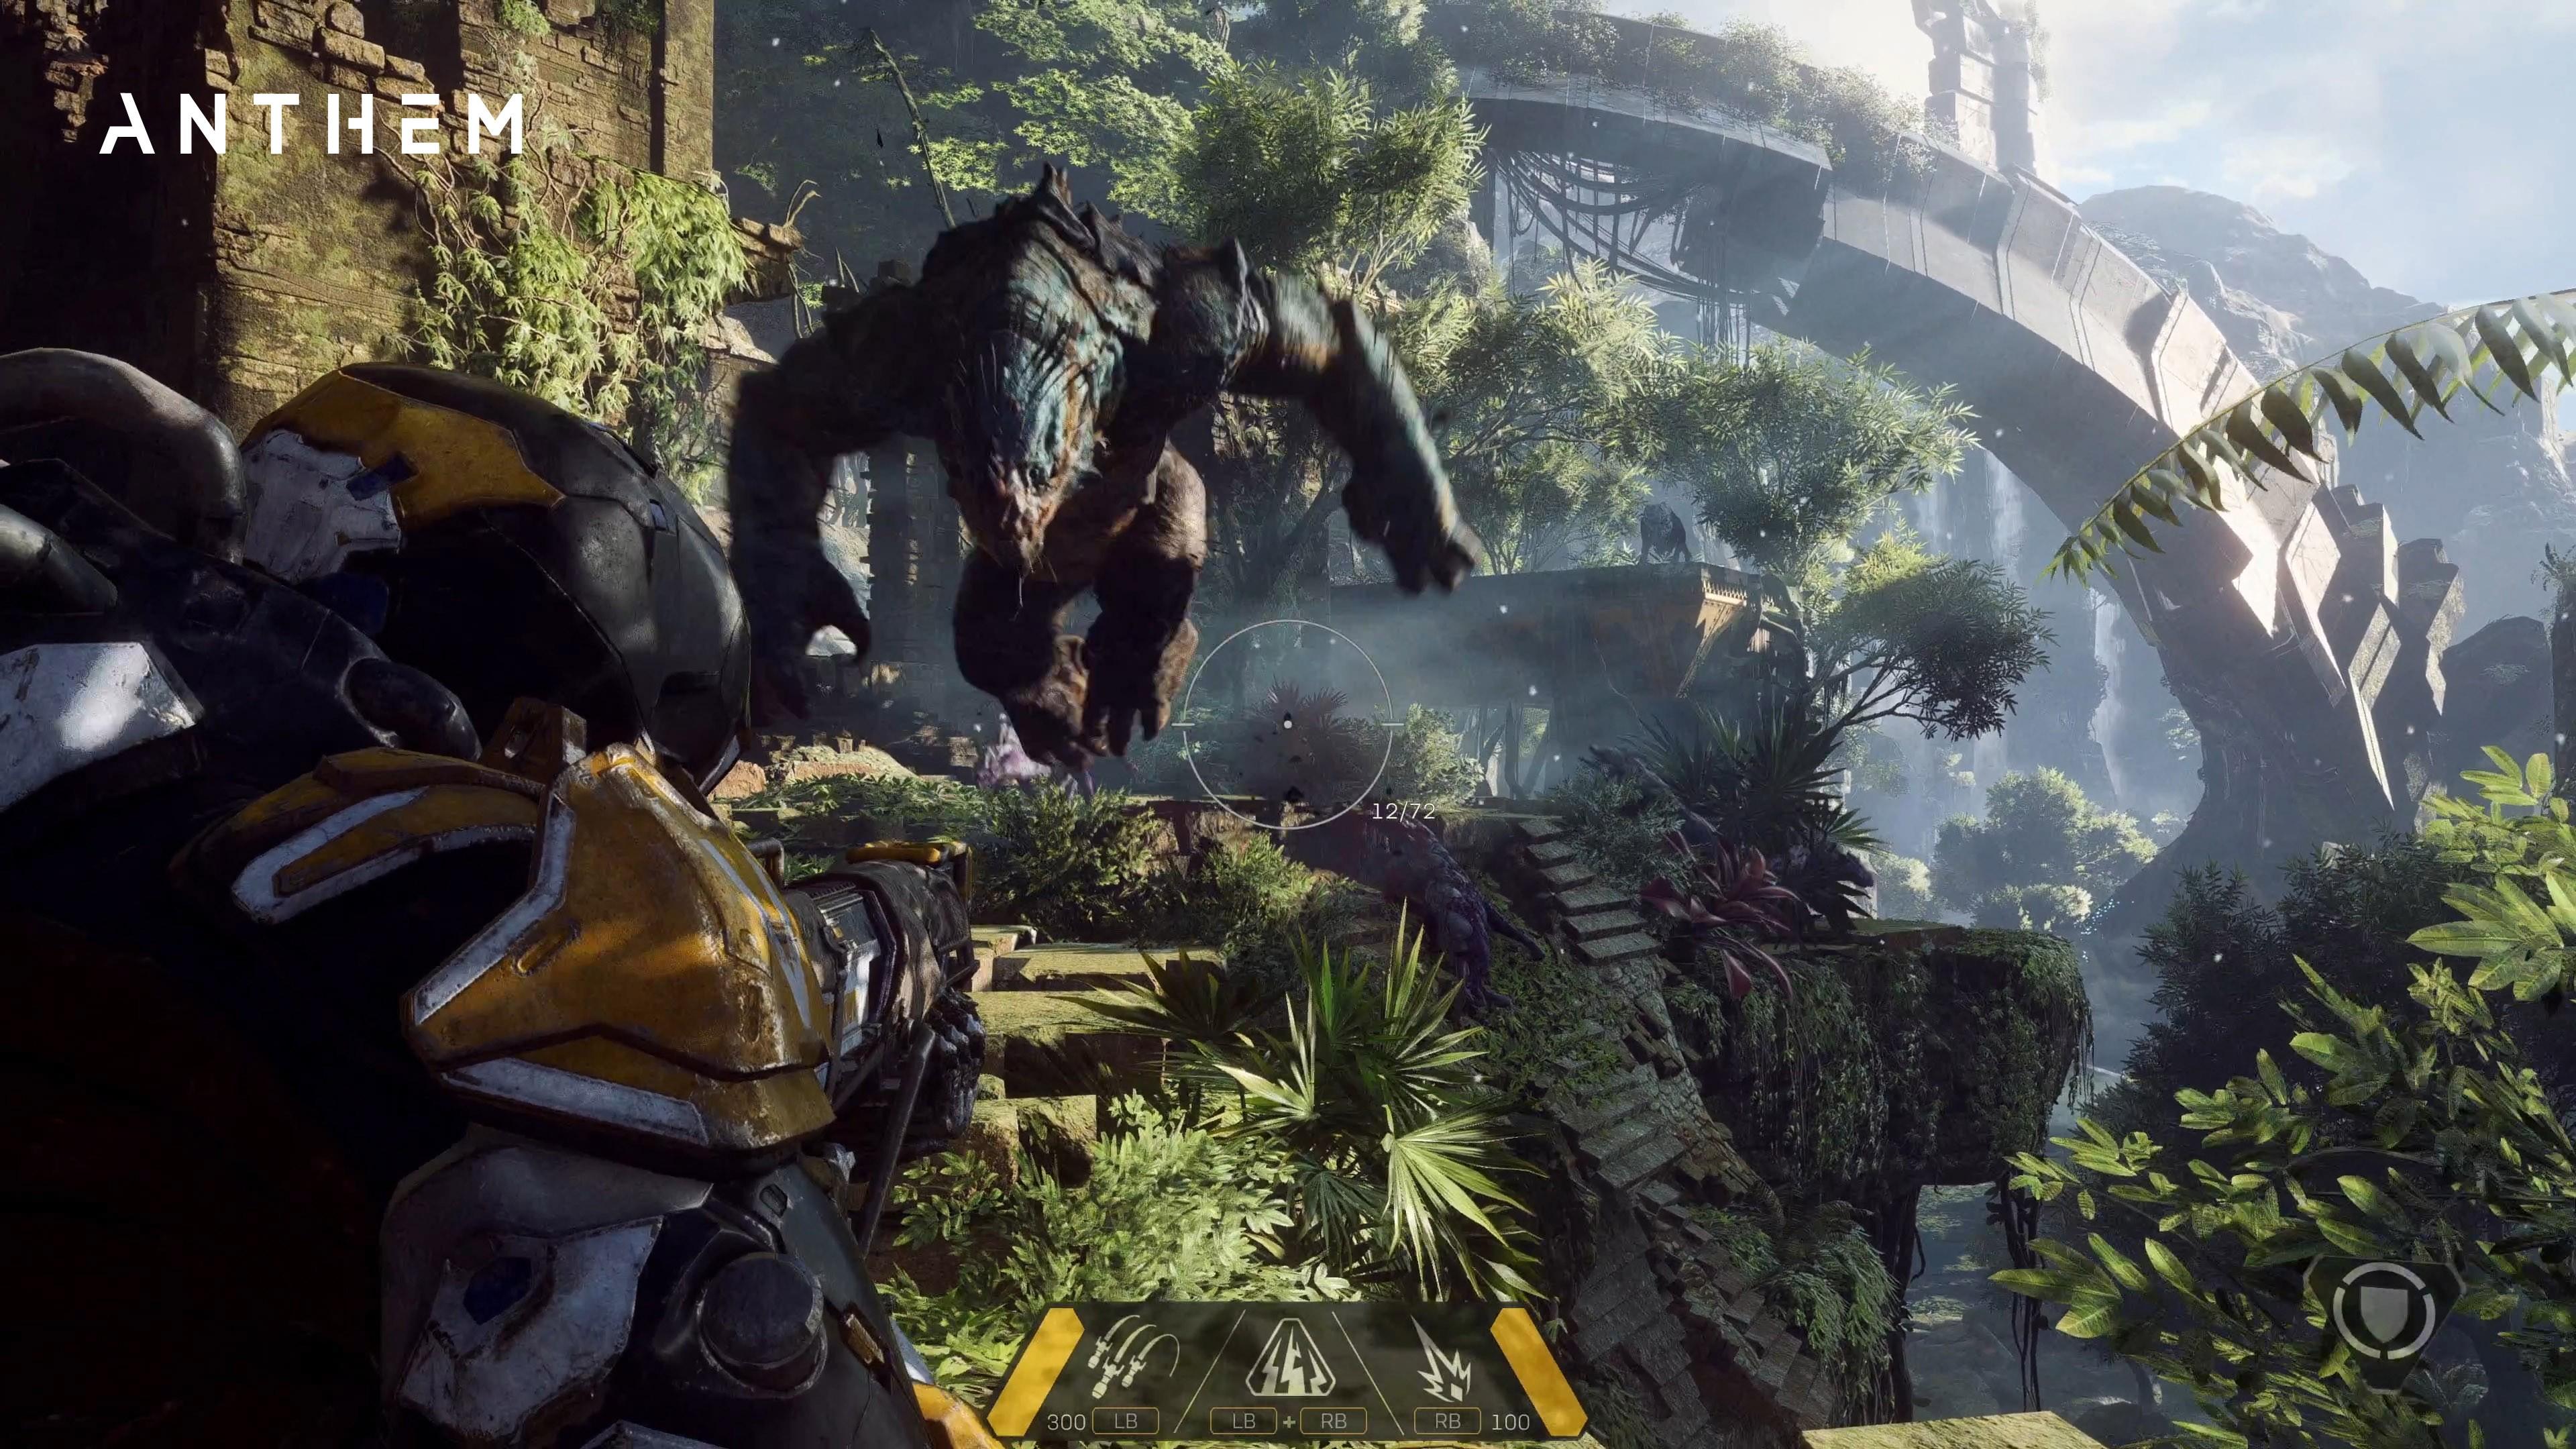 Wallpaper Anthem 4k Screenshot Gameplay E3 2017 Games 13824